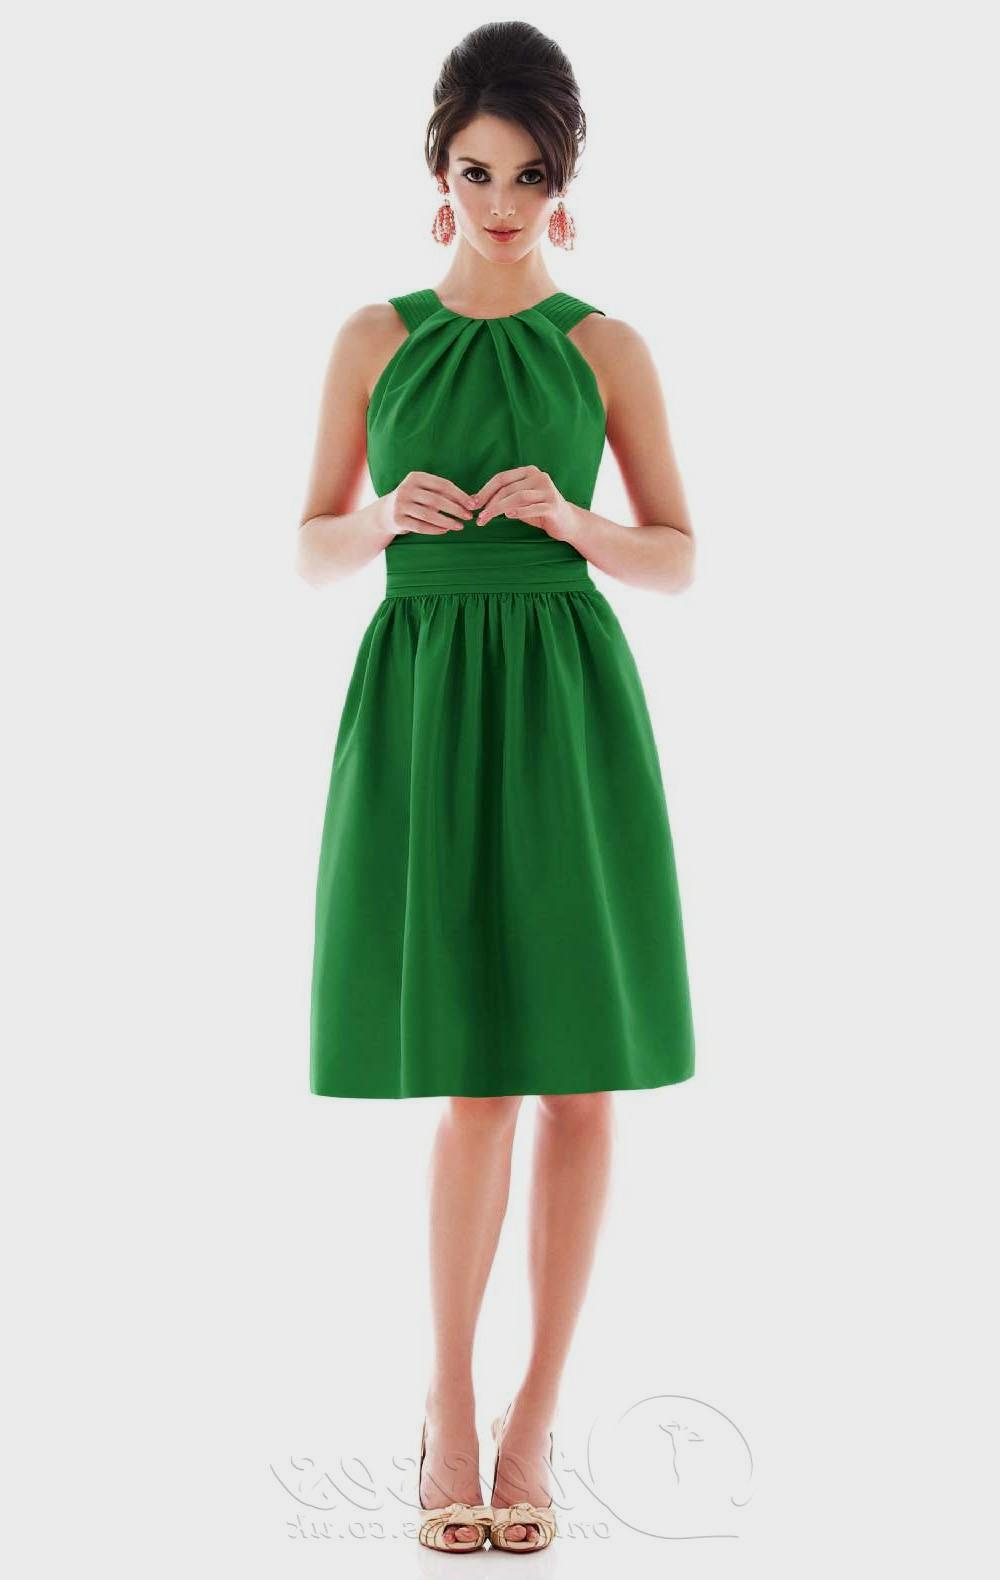 emerald green dress casual photo - 1